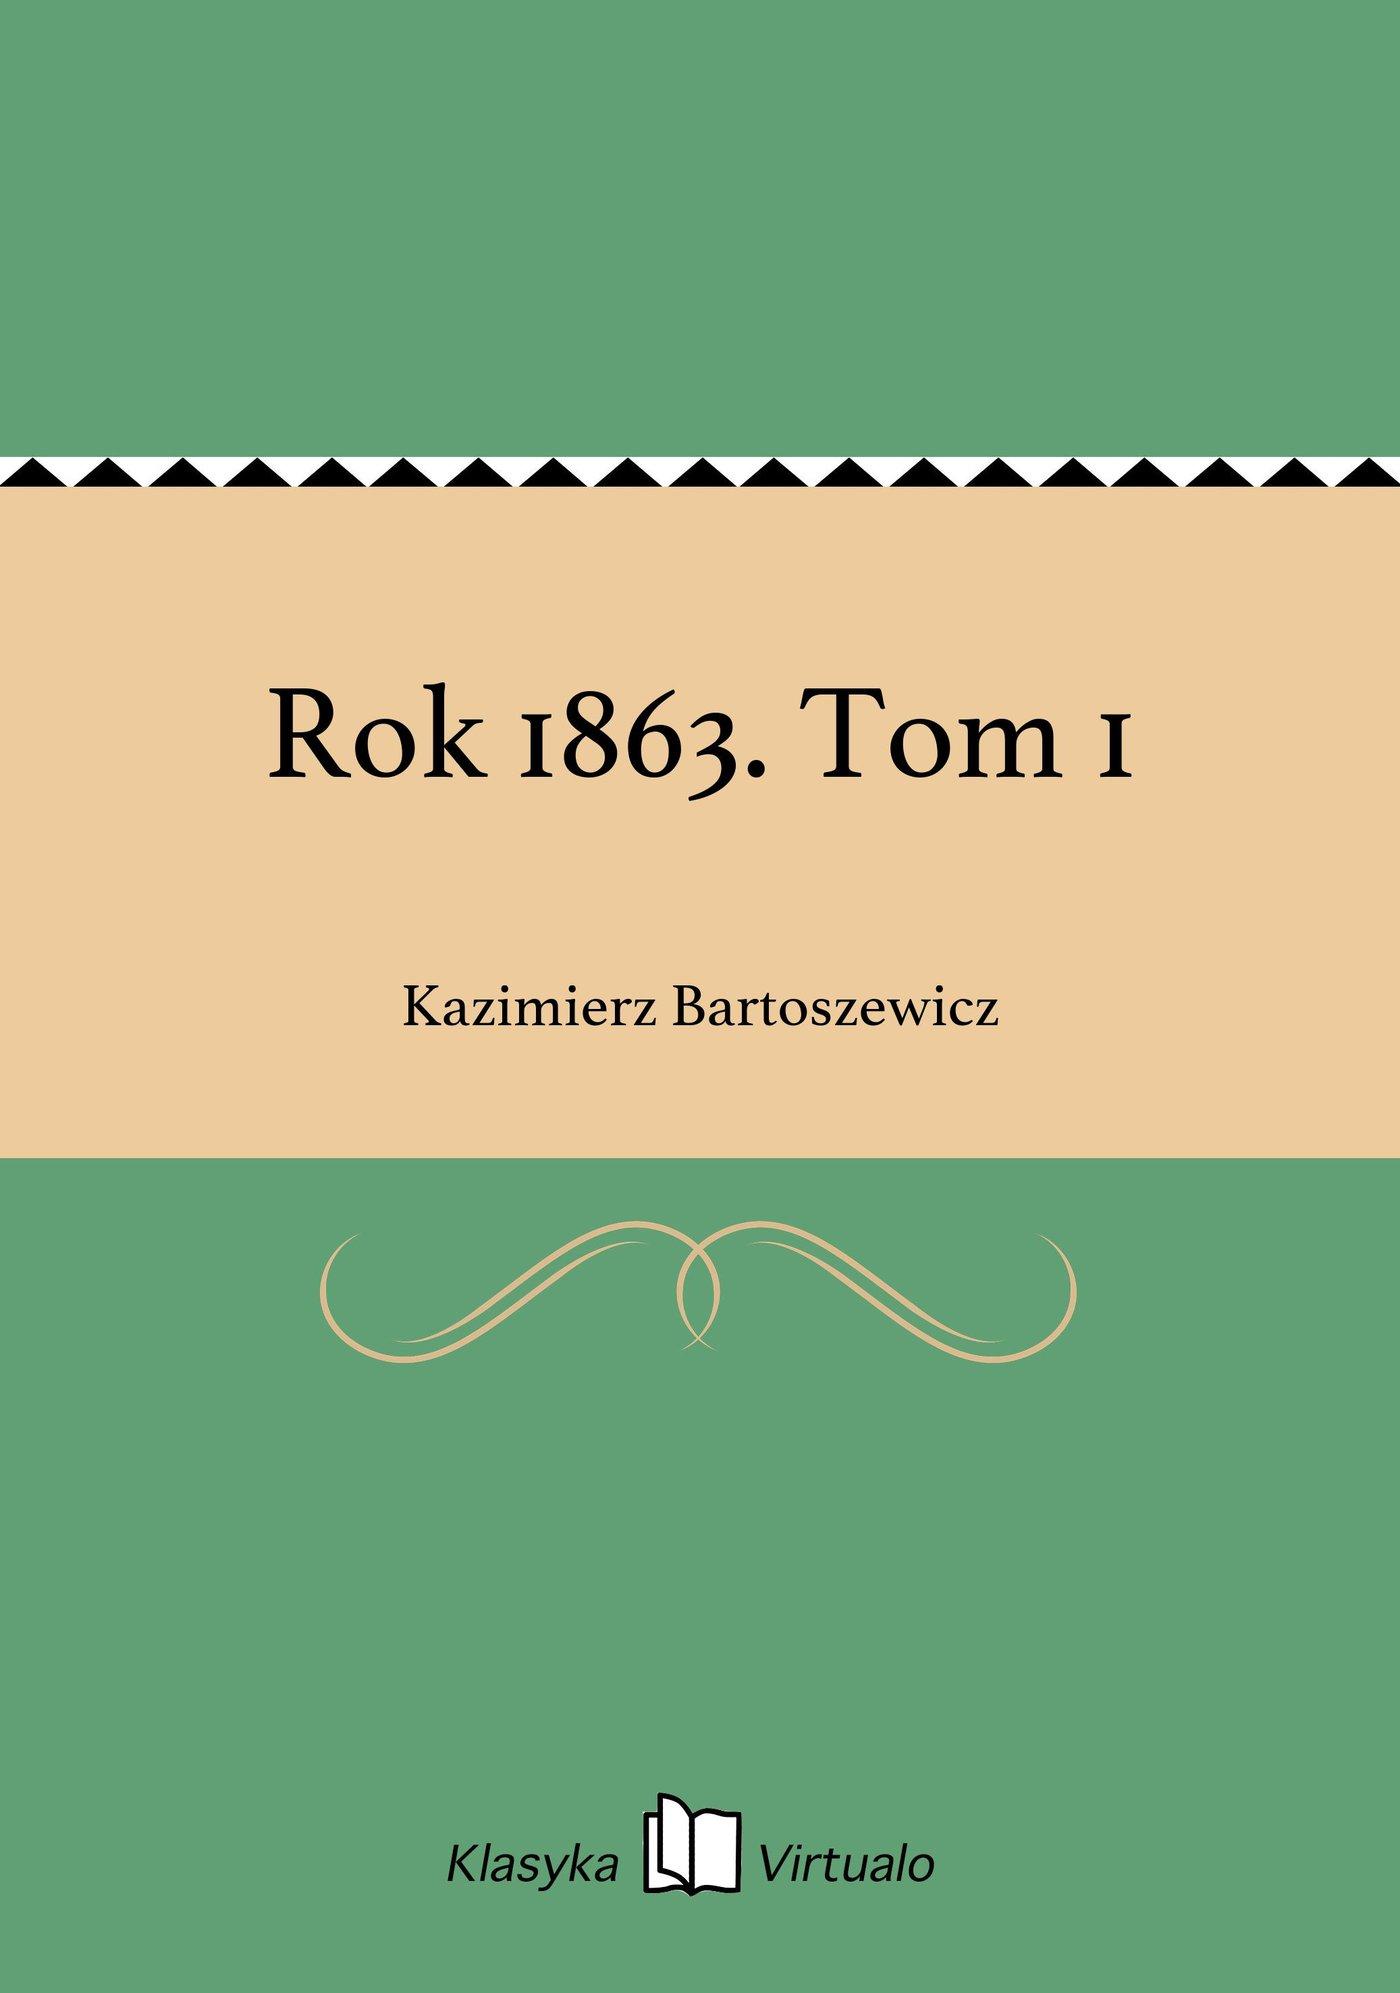 Rok 1863. Tom 1 - Ebook (Książka EPUB) do pobrania w formacie EPUB